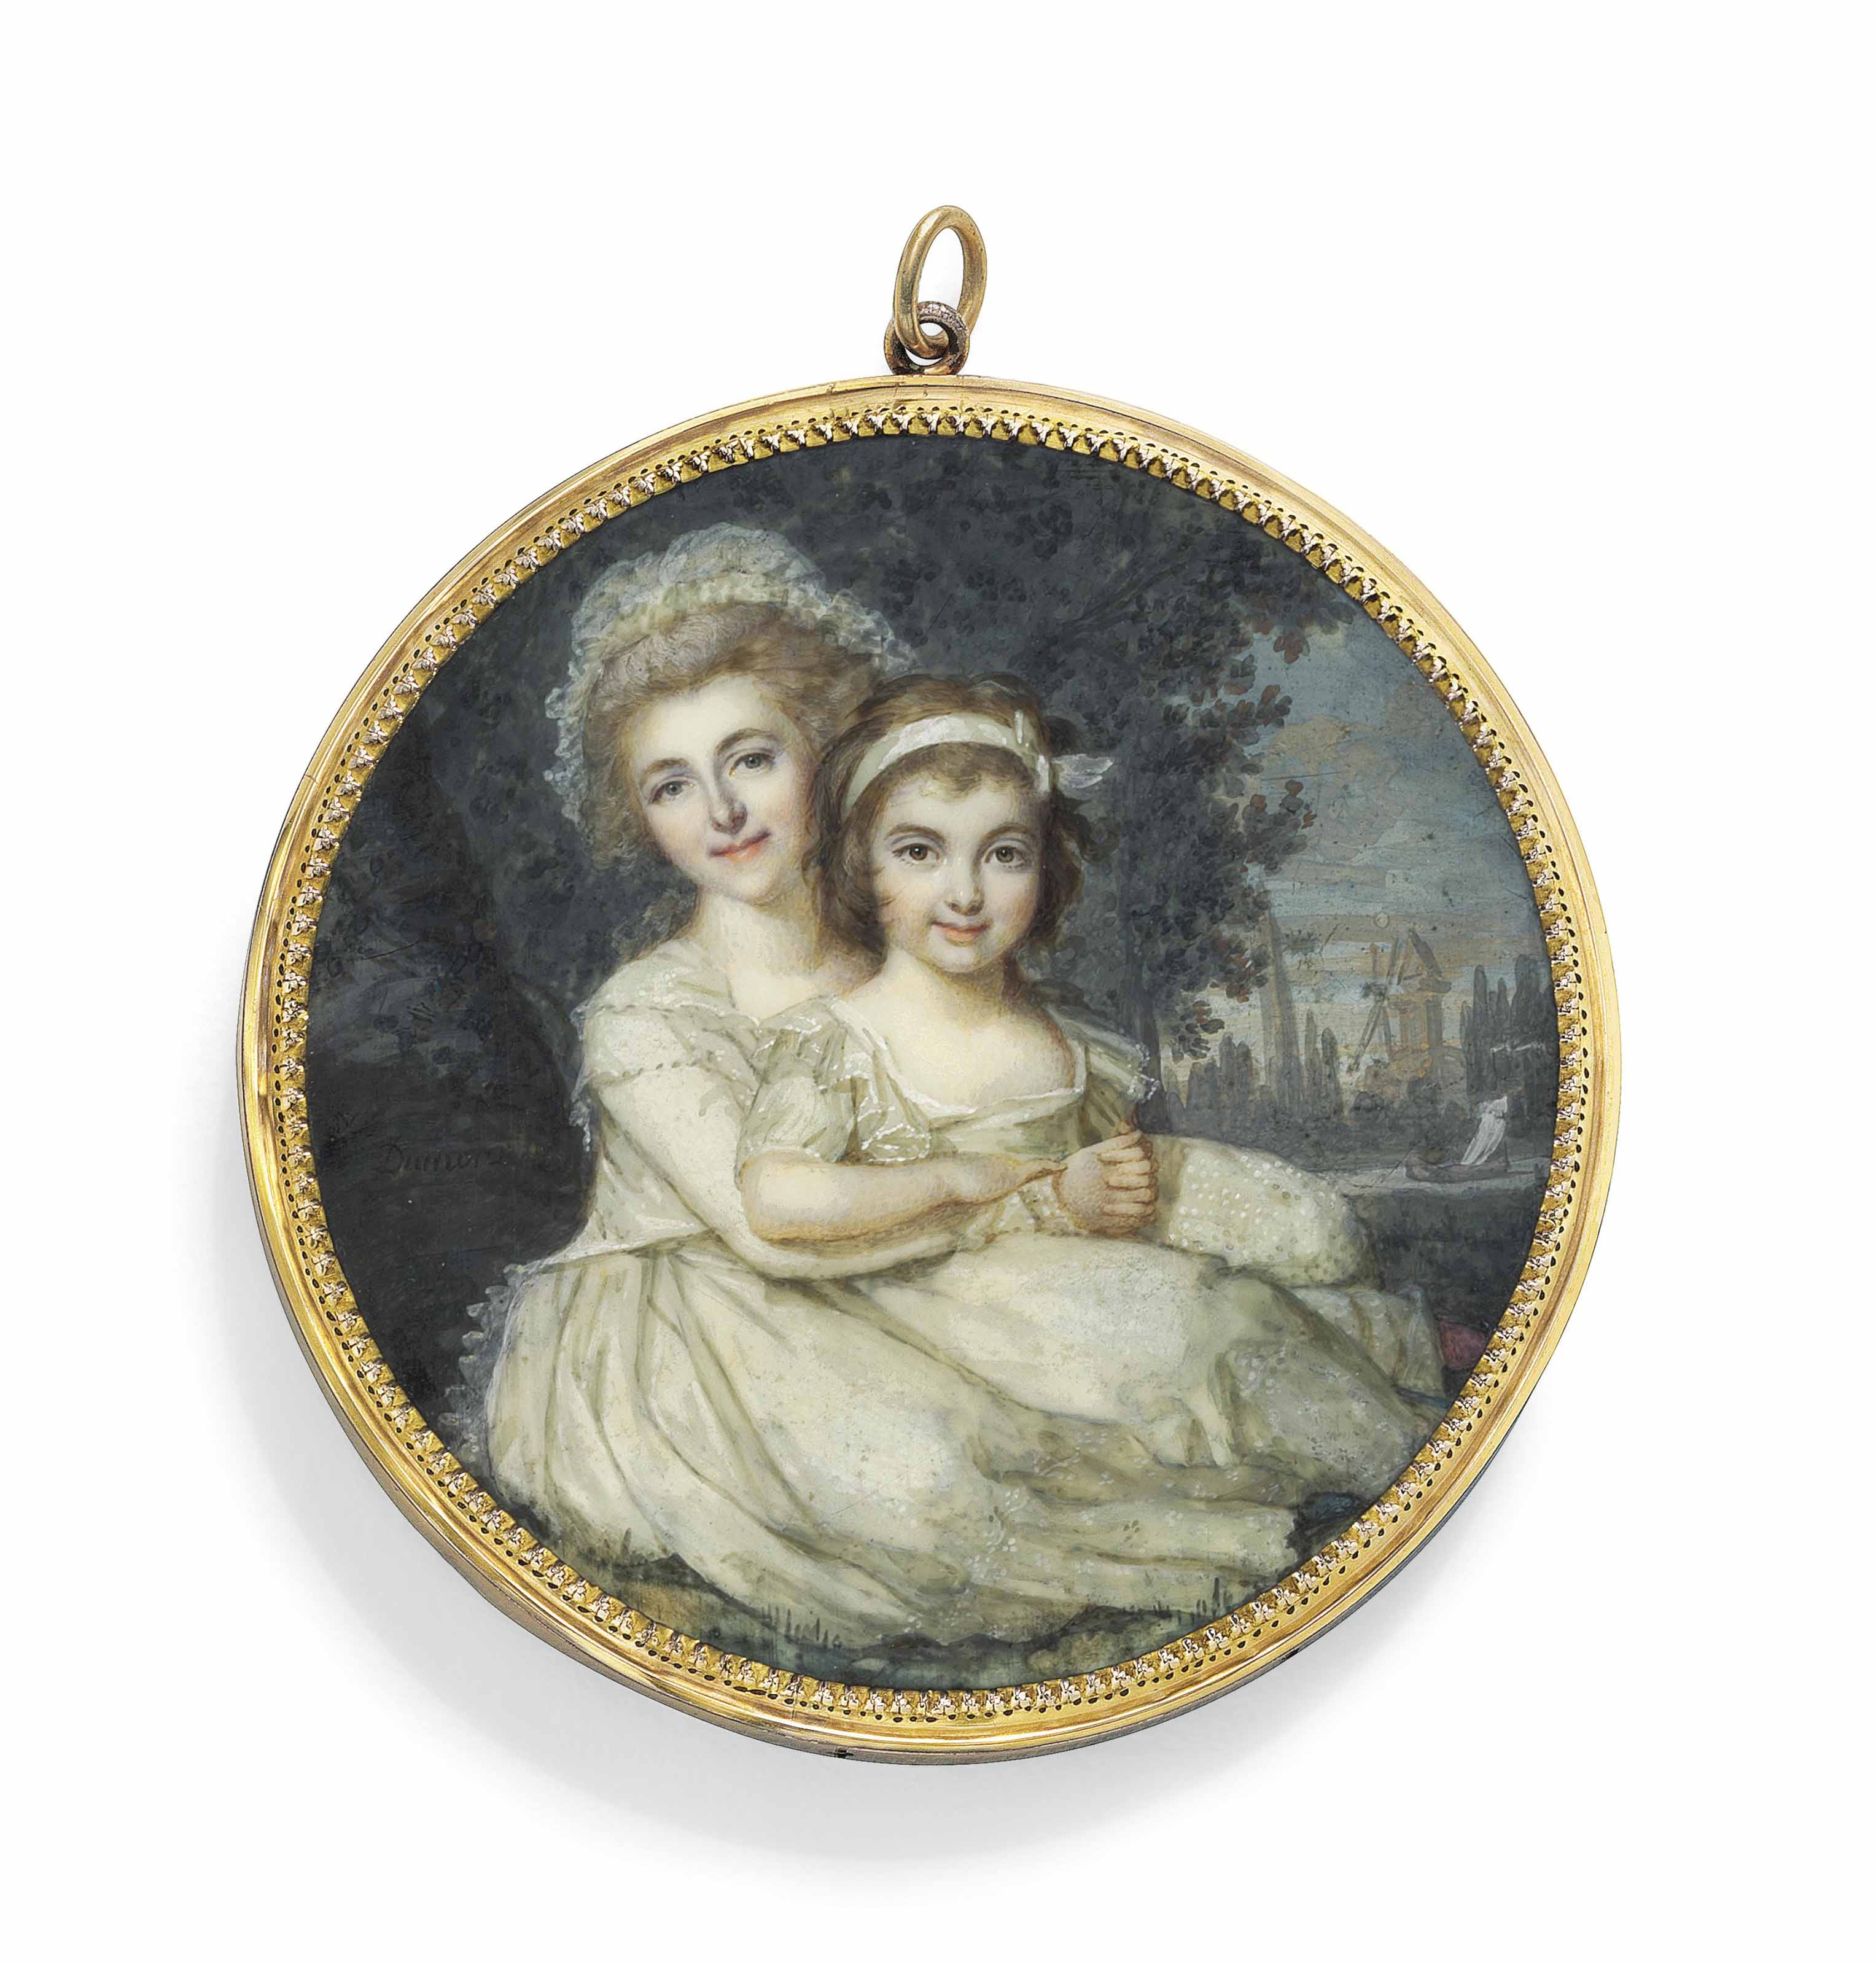 FRANÇOIS DUMONT (FRENCH, 1751-1831)